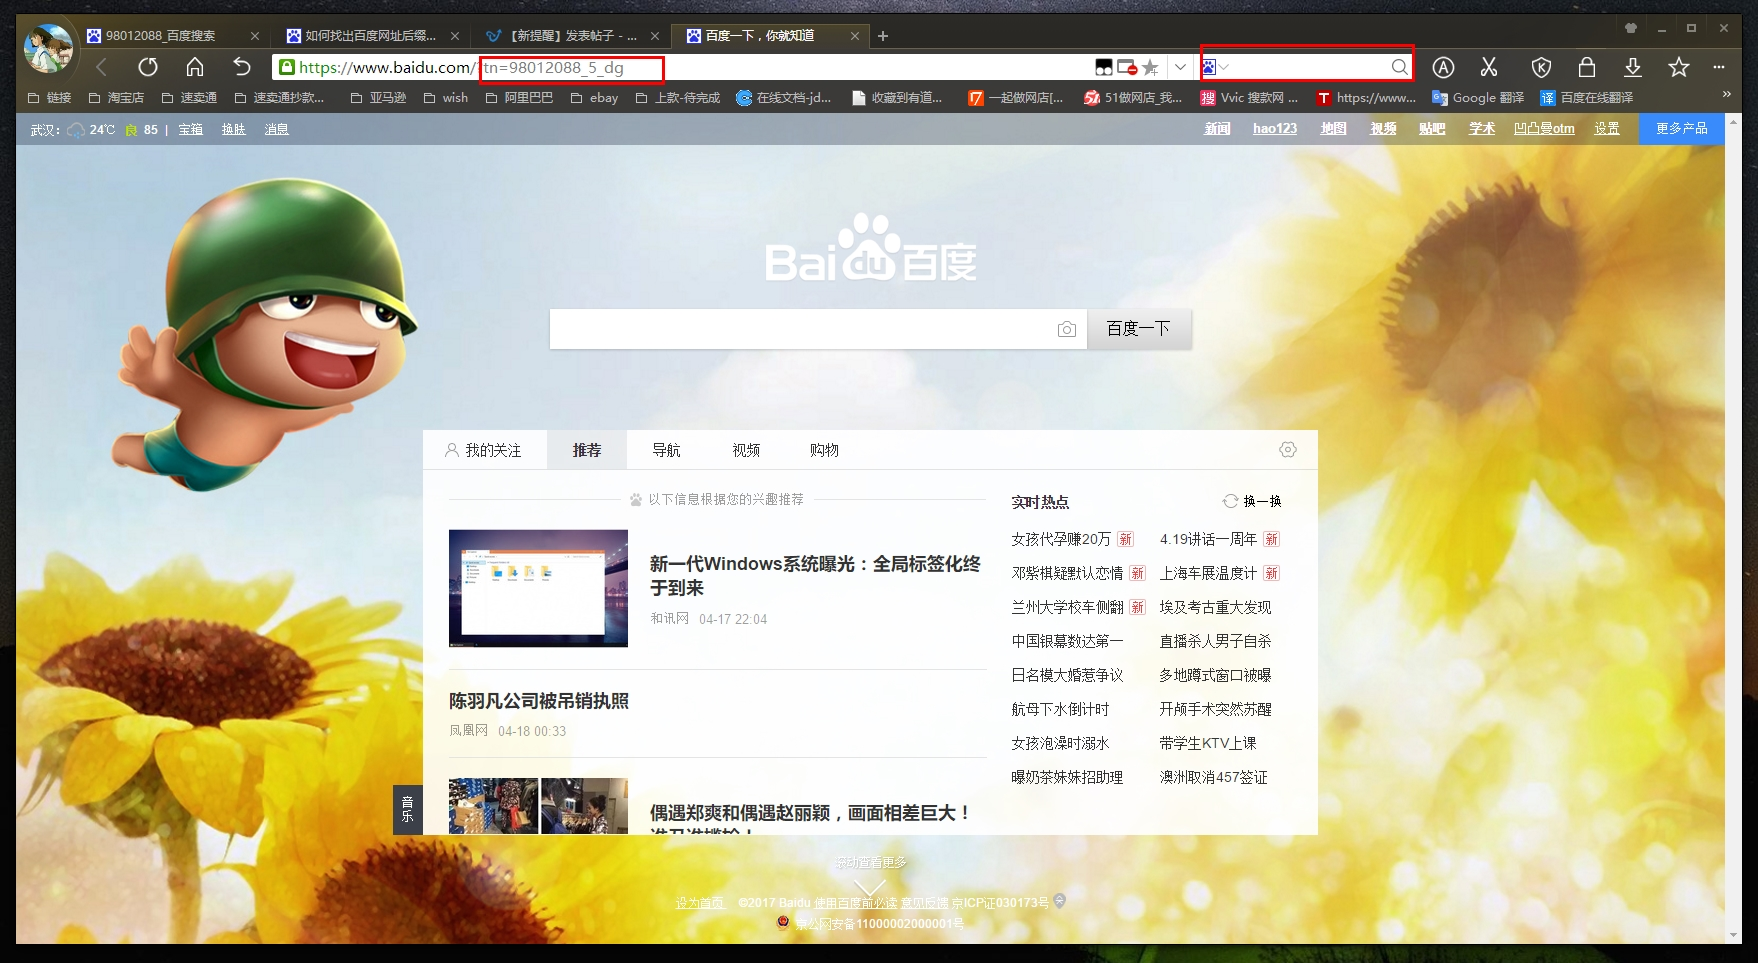 WWW_IJERA_COM_baidu.com/?tn=98012088_5_dg